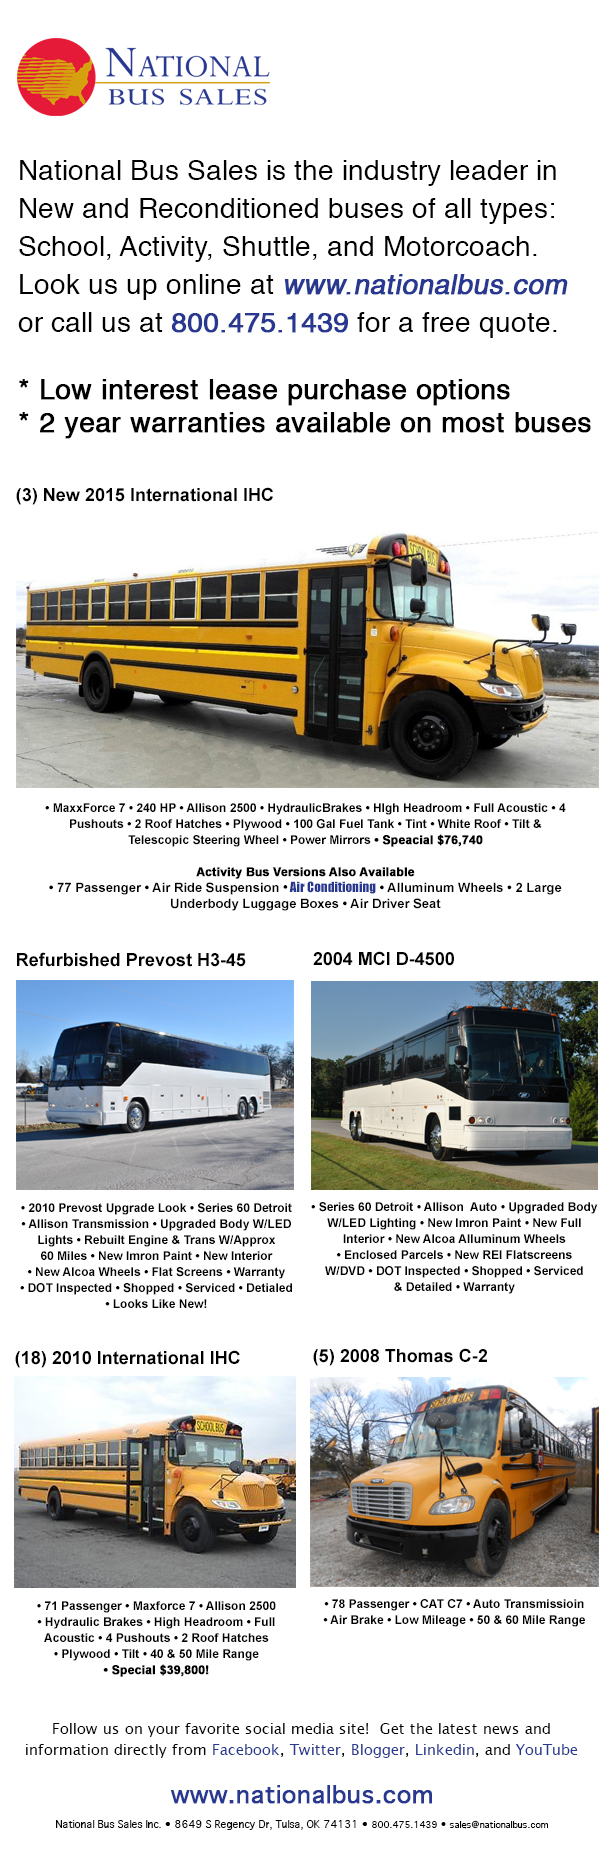 2010 international school bus for sale